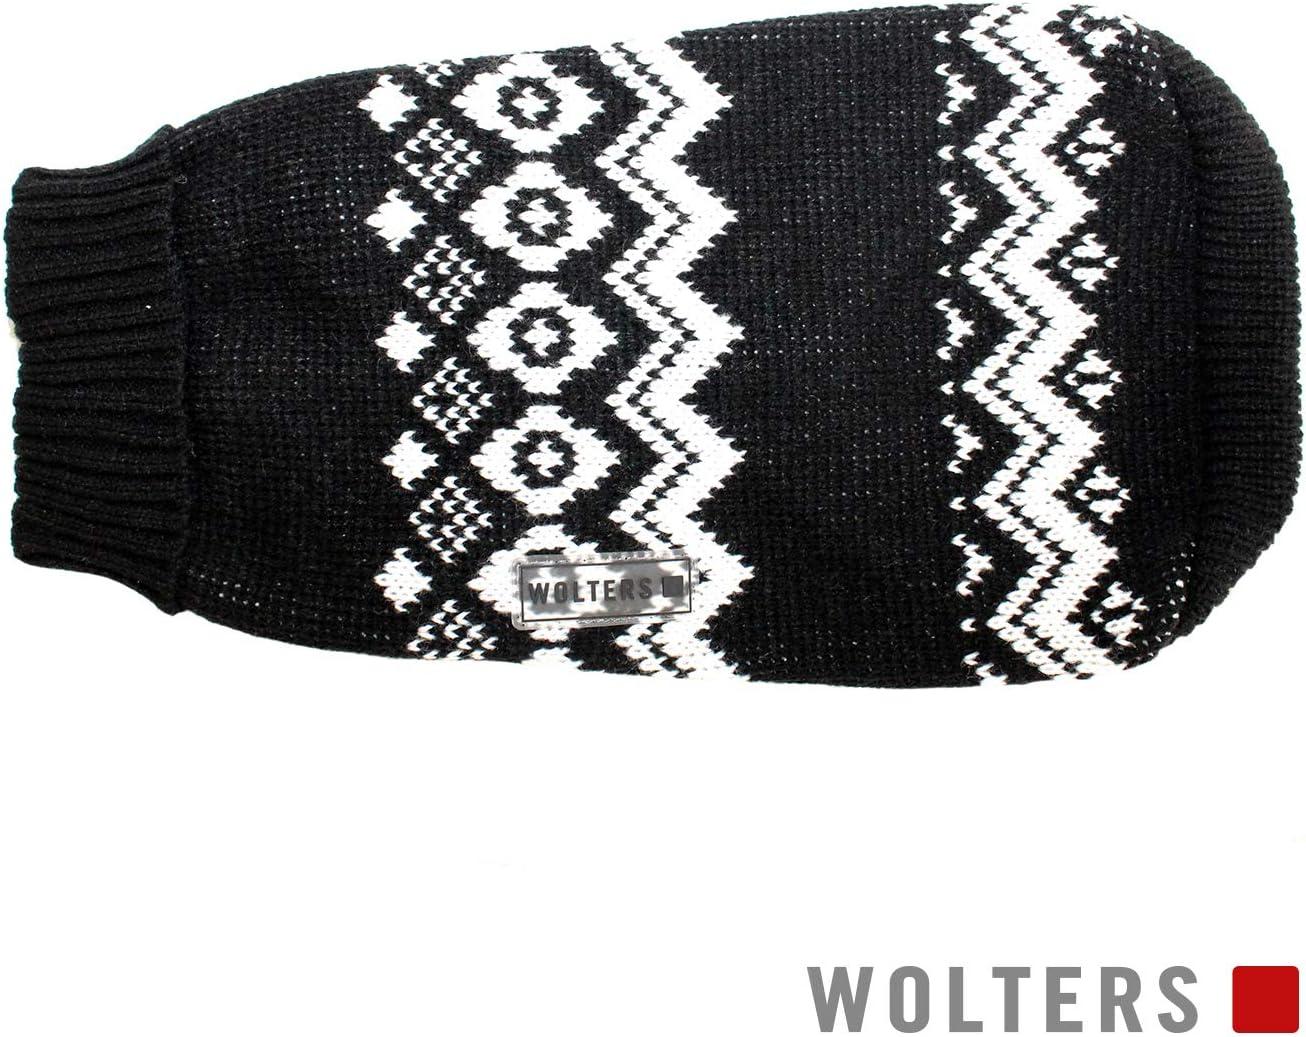 versch Wolters Norweger Pullover f/ür Hunde XL Farben Hundbekleidung XS